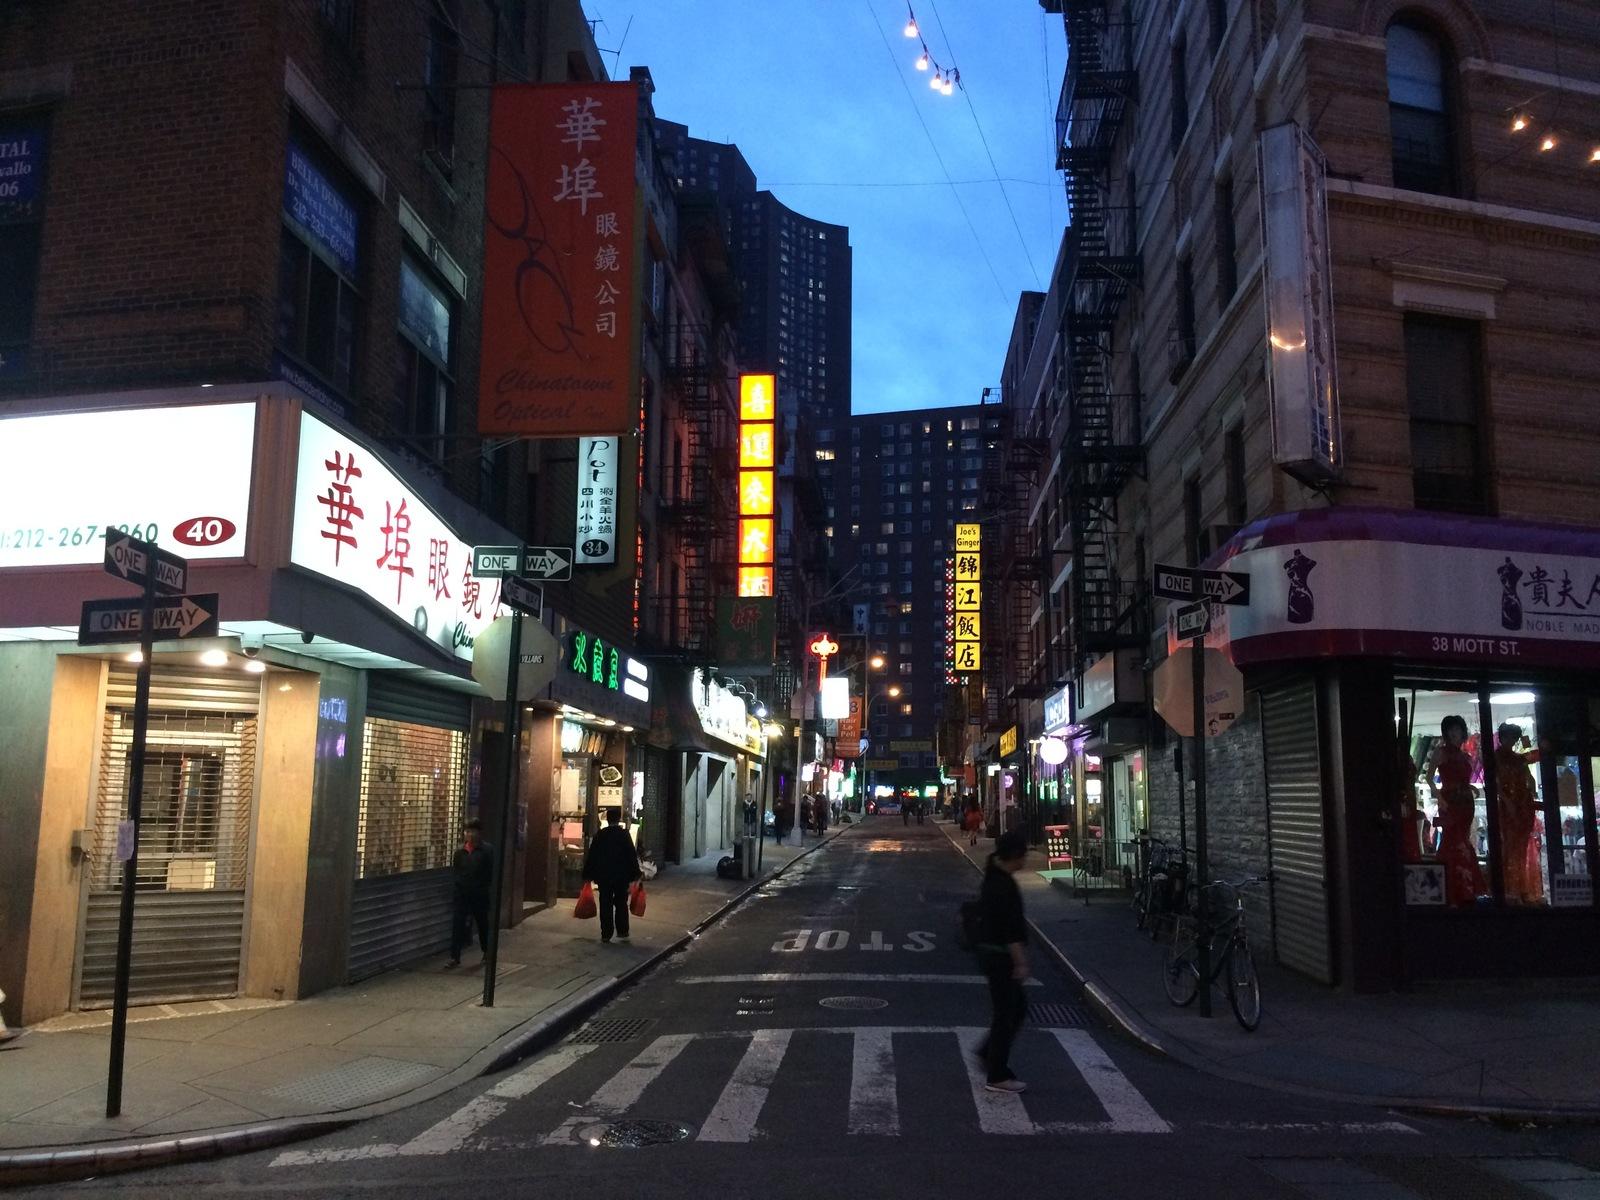 Обои ночь, движение, manhatten, чайнатаун, улица, здание, манхеттен. Города foto 13